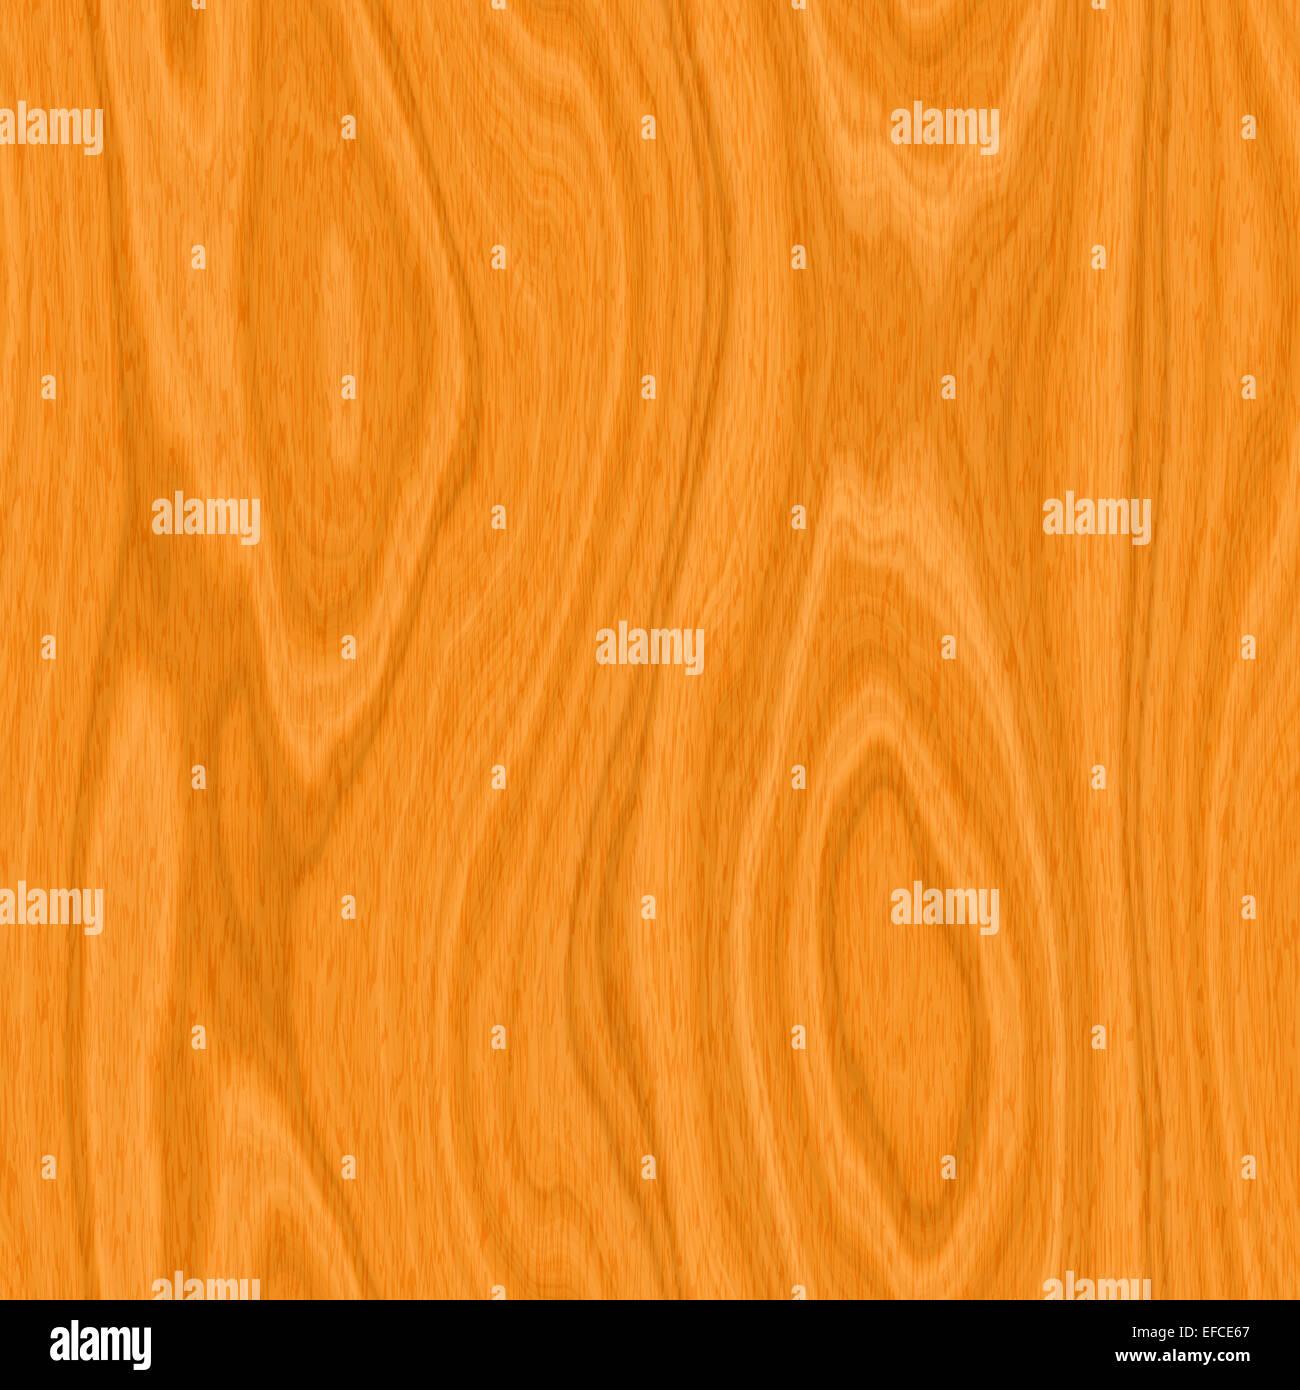 Closeup view of wooden laminated flooring - Stock Image